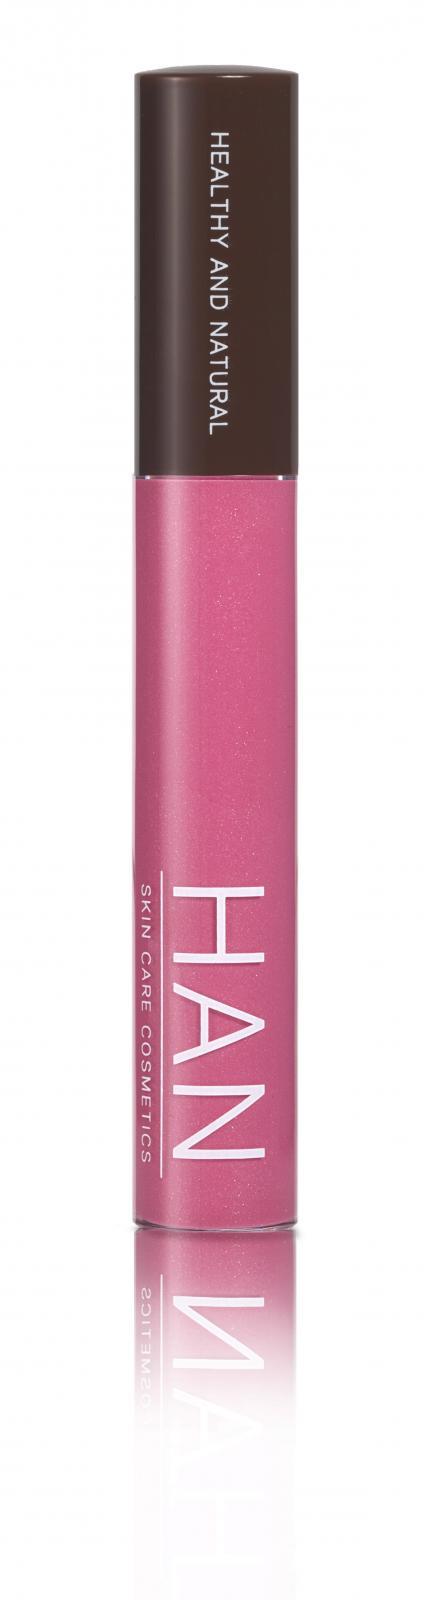 HAN Skin Care Cosmetics Lip Gloss - Pretty Cool Pink